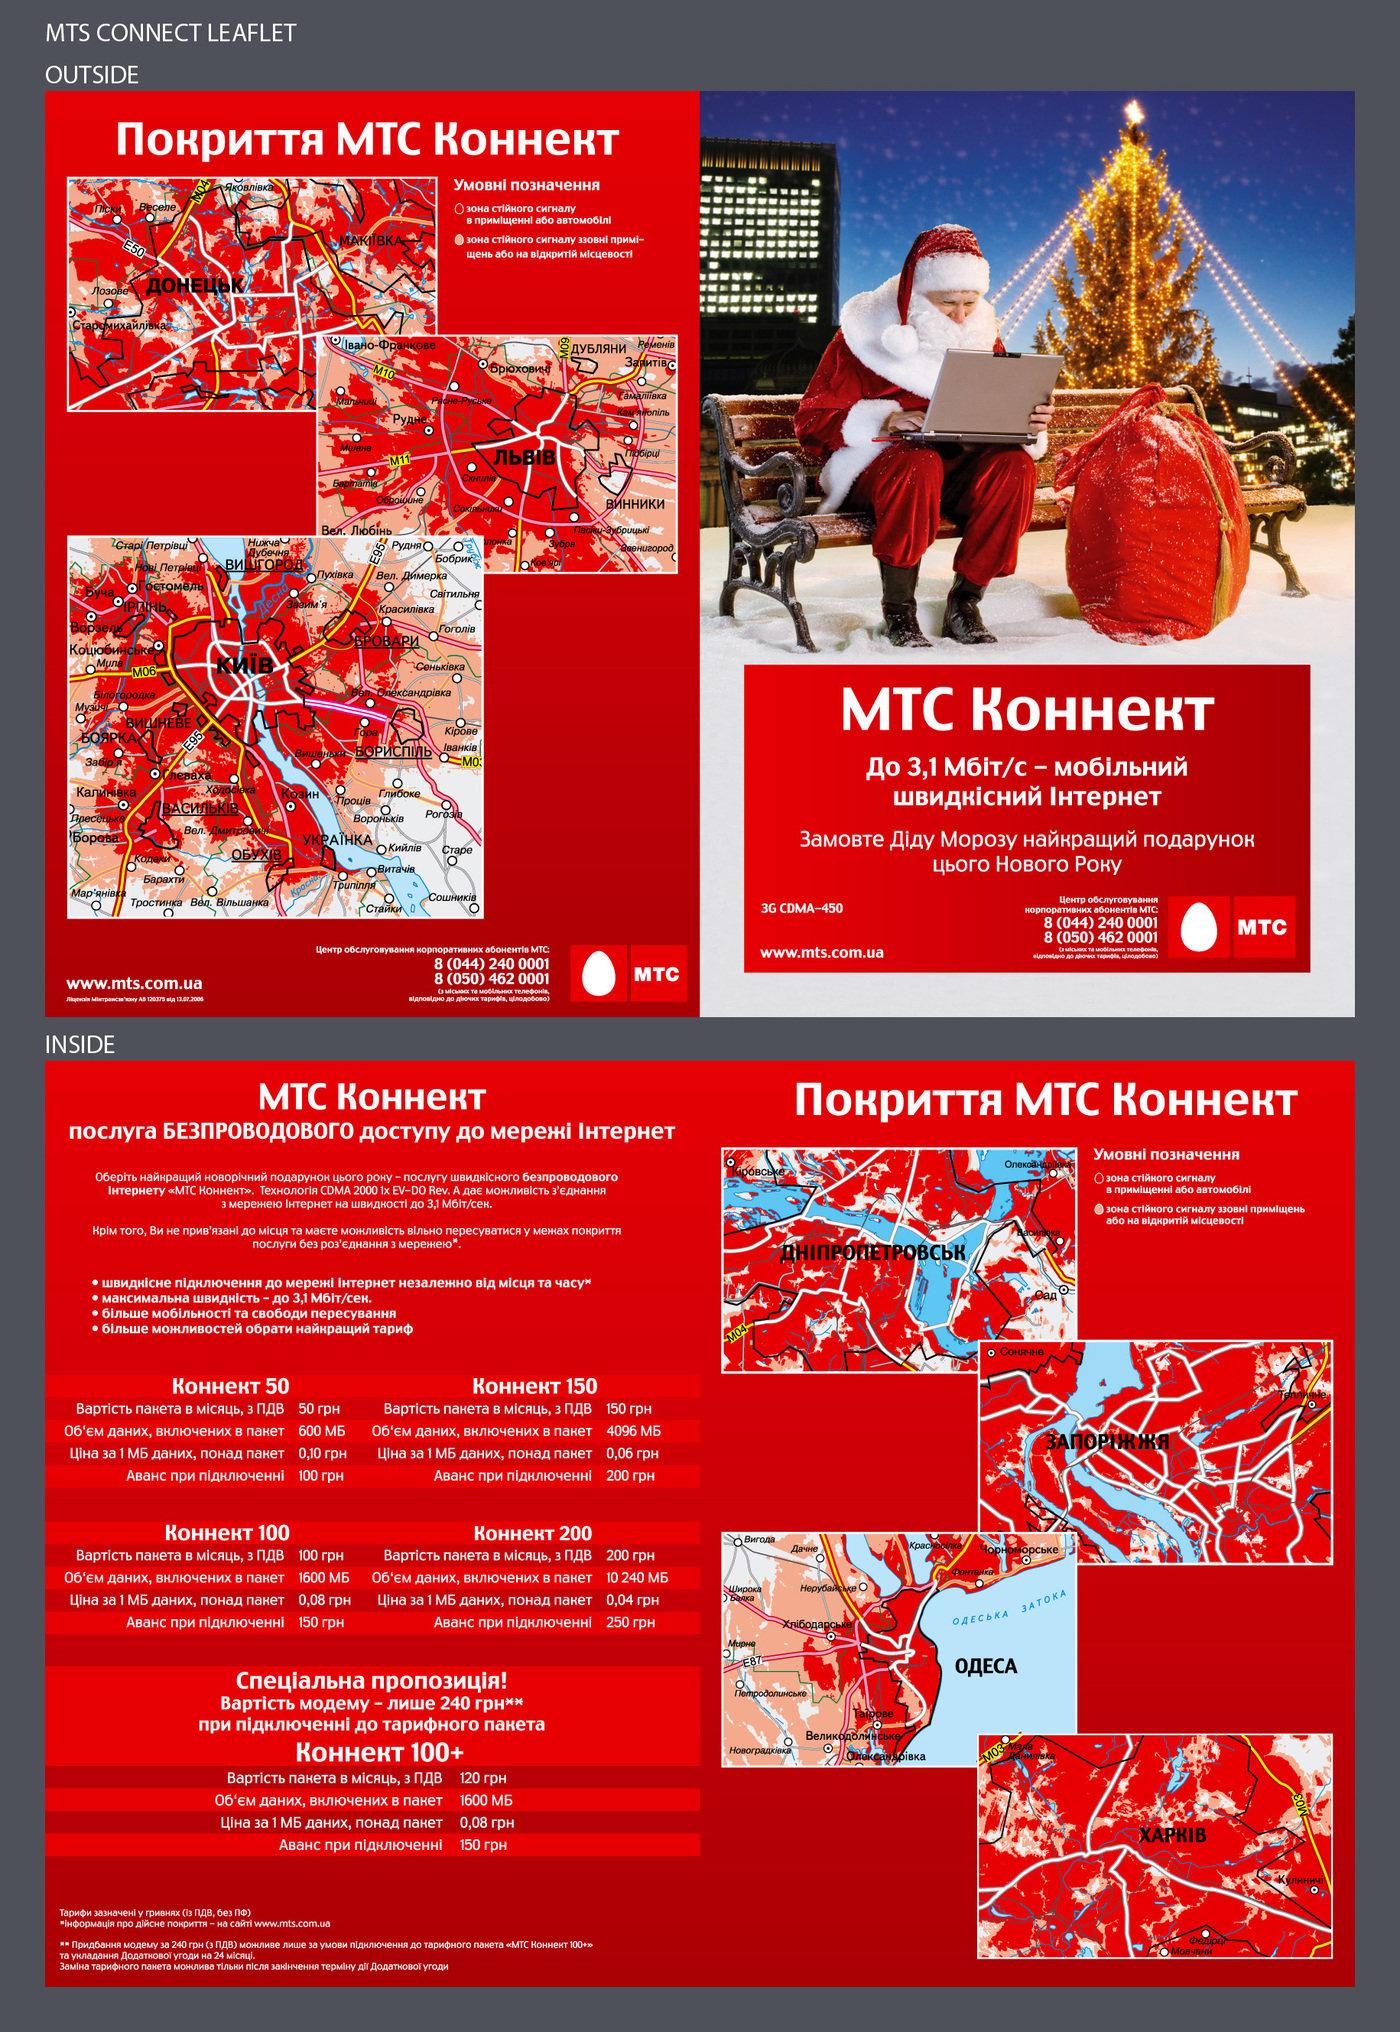 Leaflet by Andrew Kramar at Coroflot com